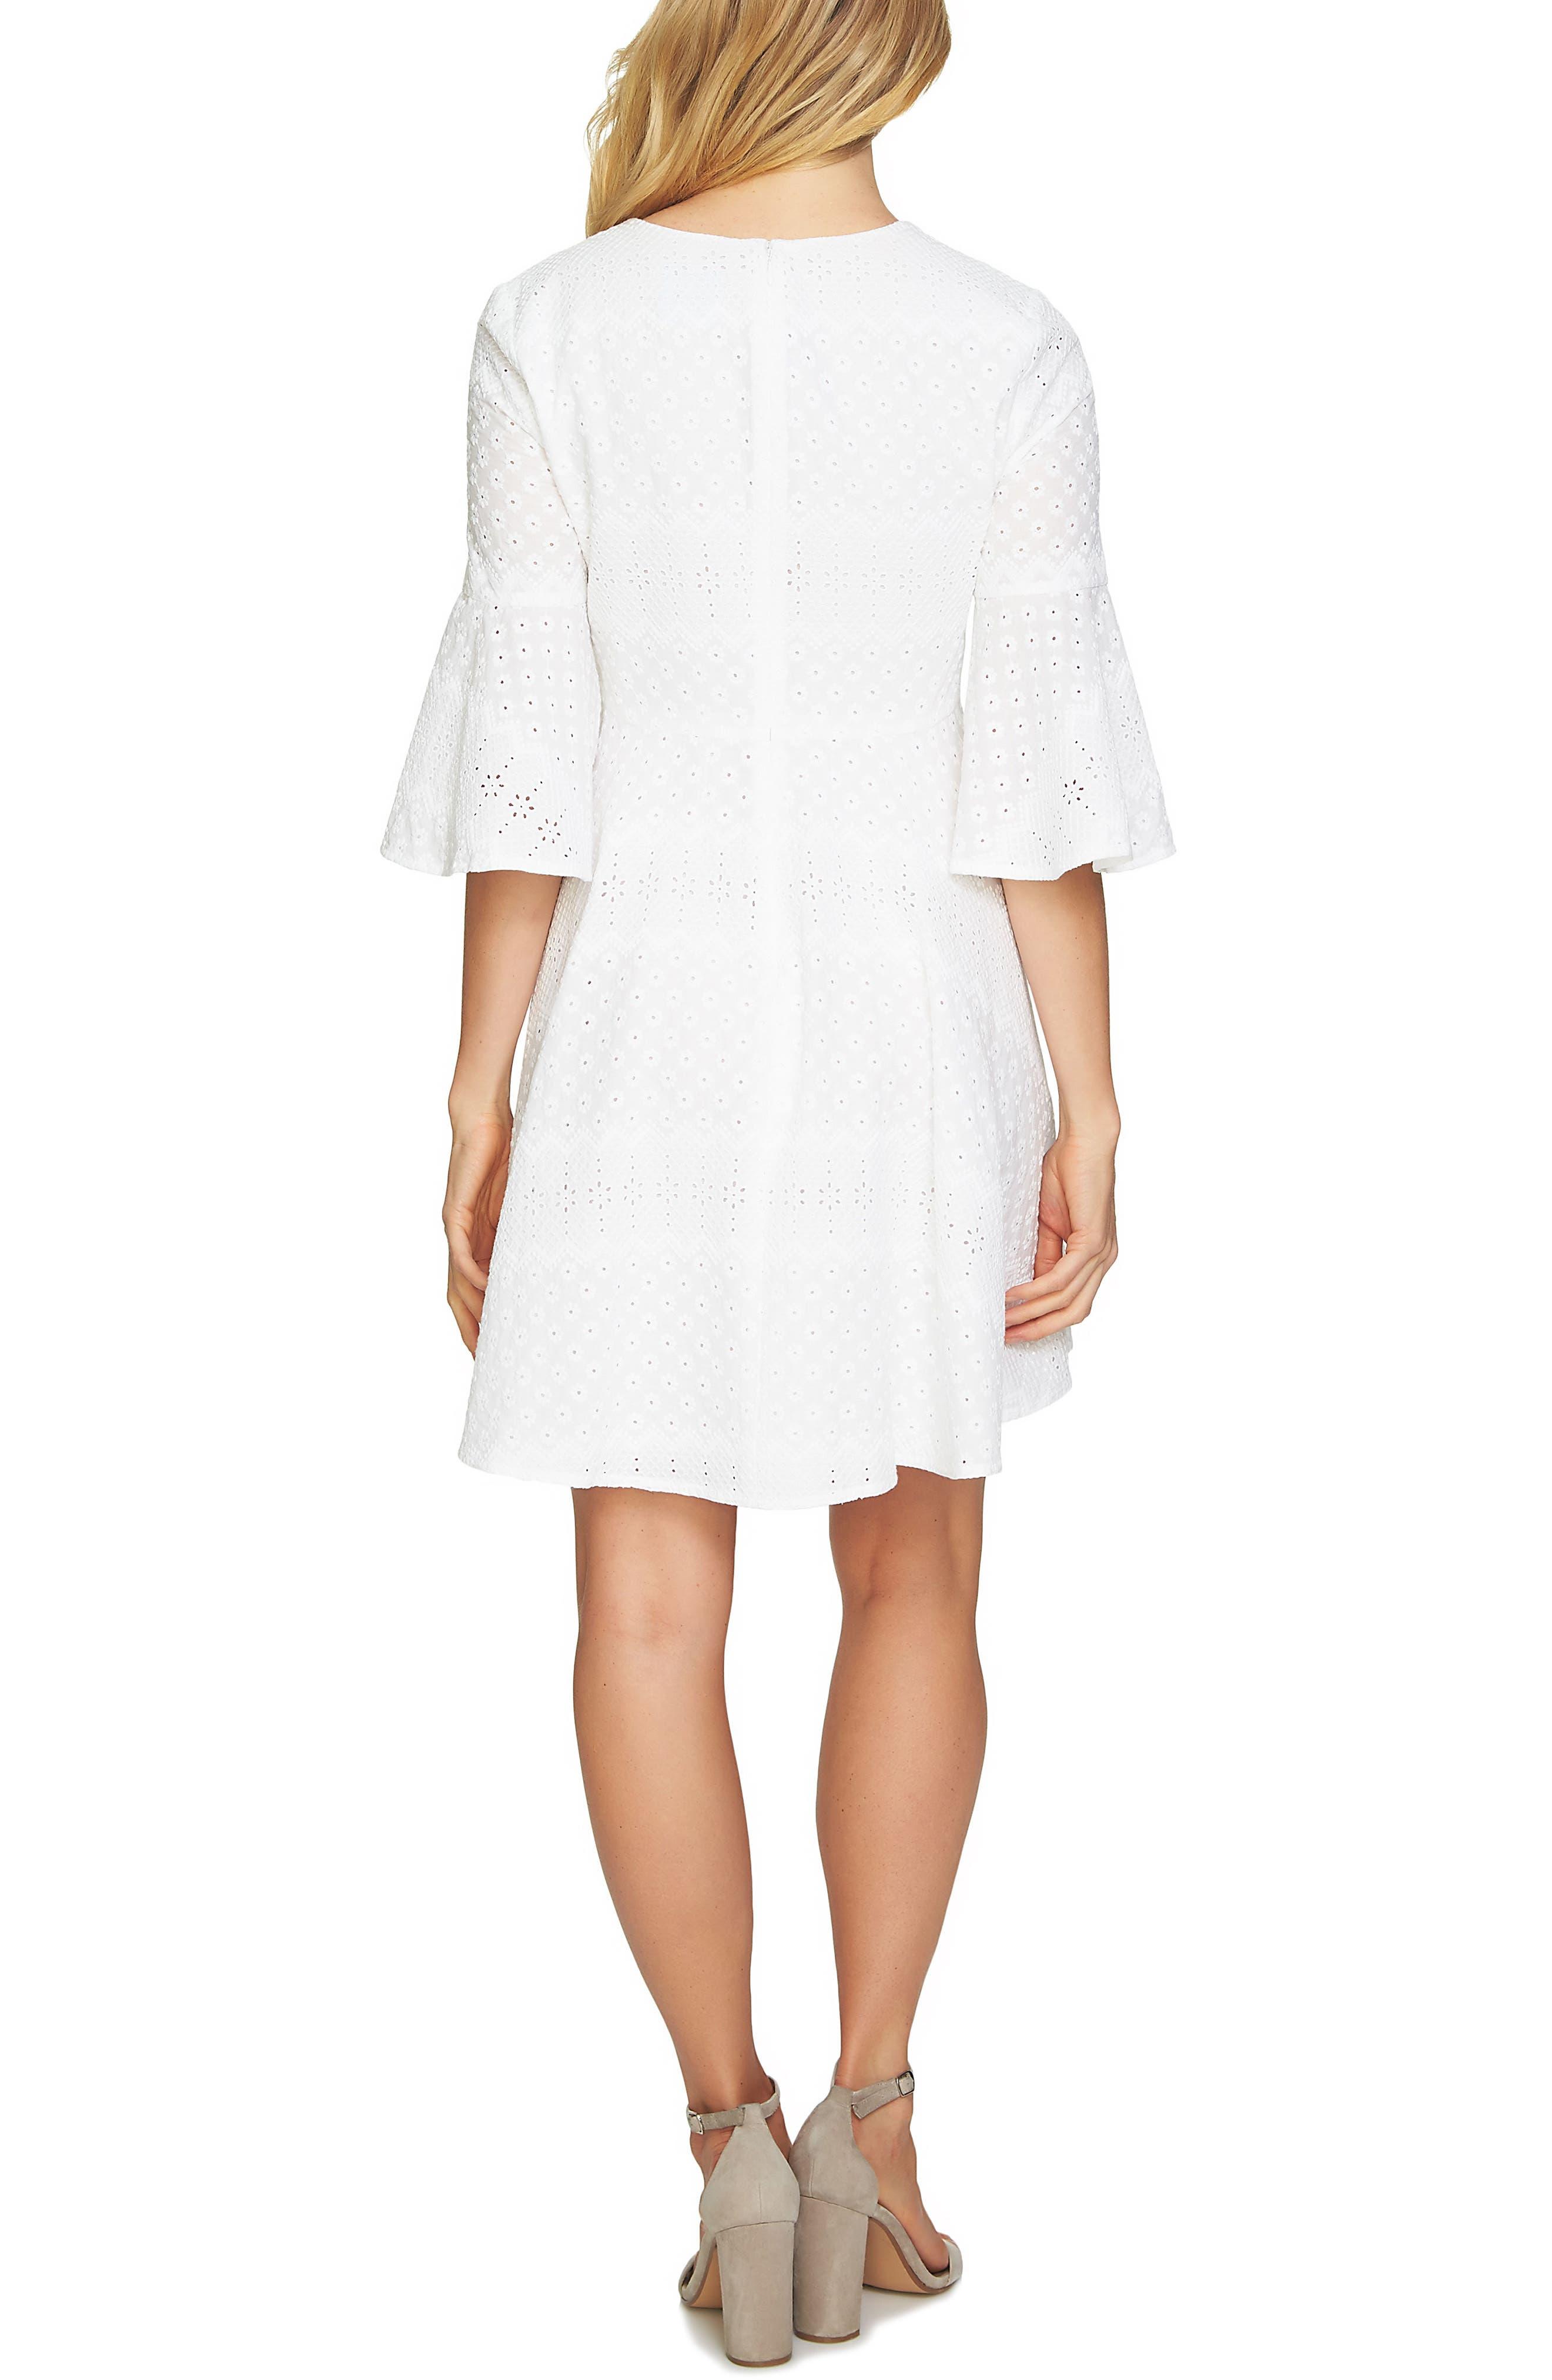 Bell Sleeve Eyelet A-Line Dress,                             Alternate thumbnail 2, color,                             160